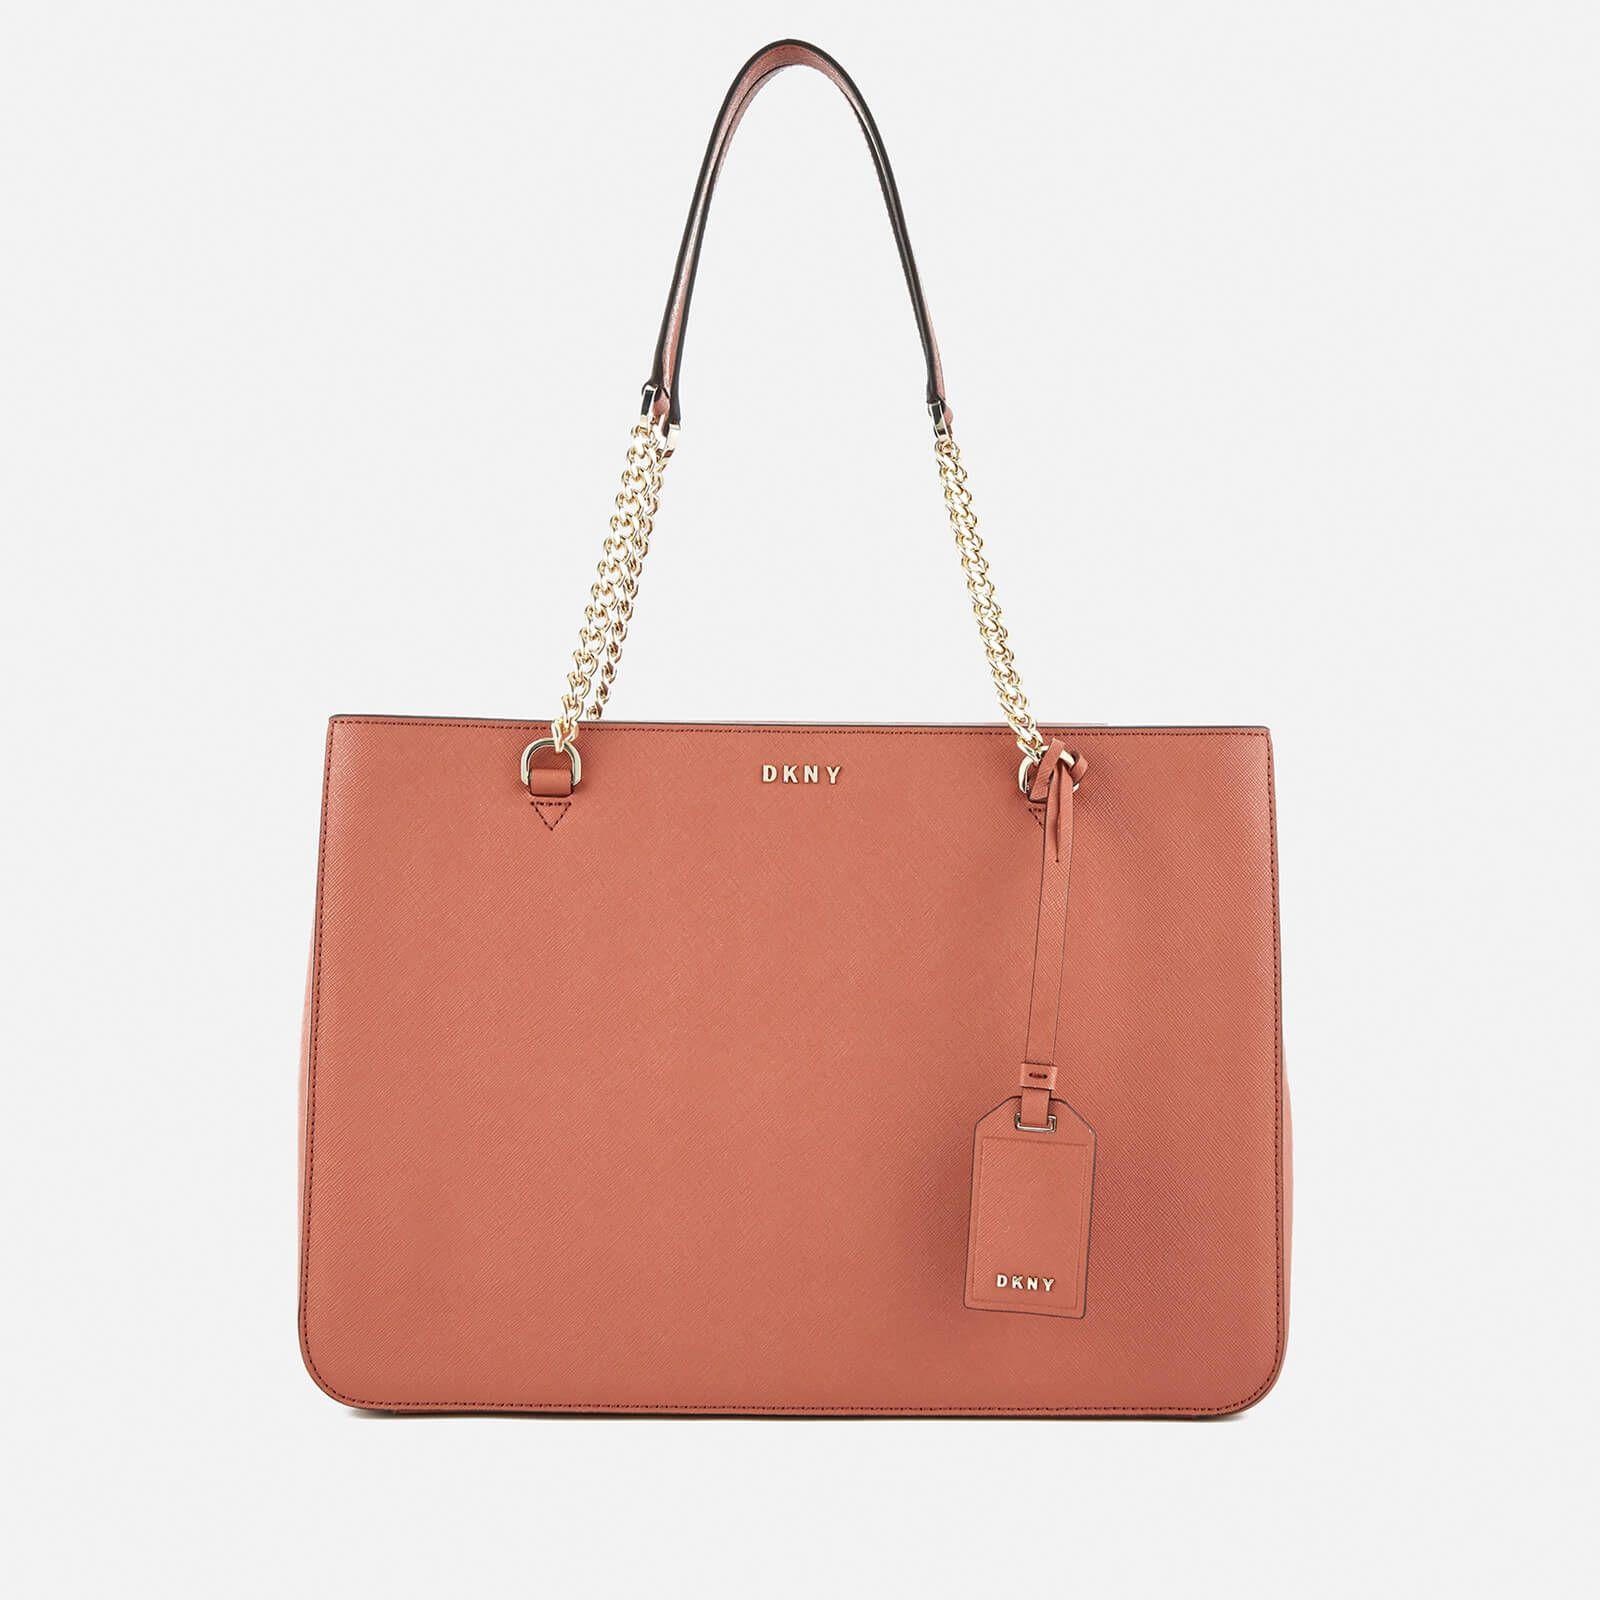 DKNY Women's Bryant Park Shopper Tote Bag Terracotta